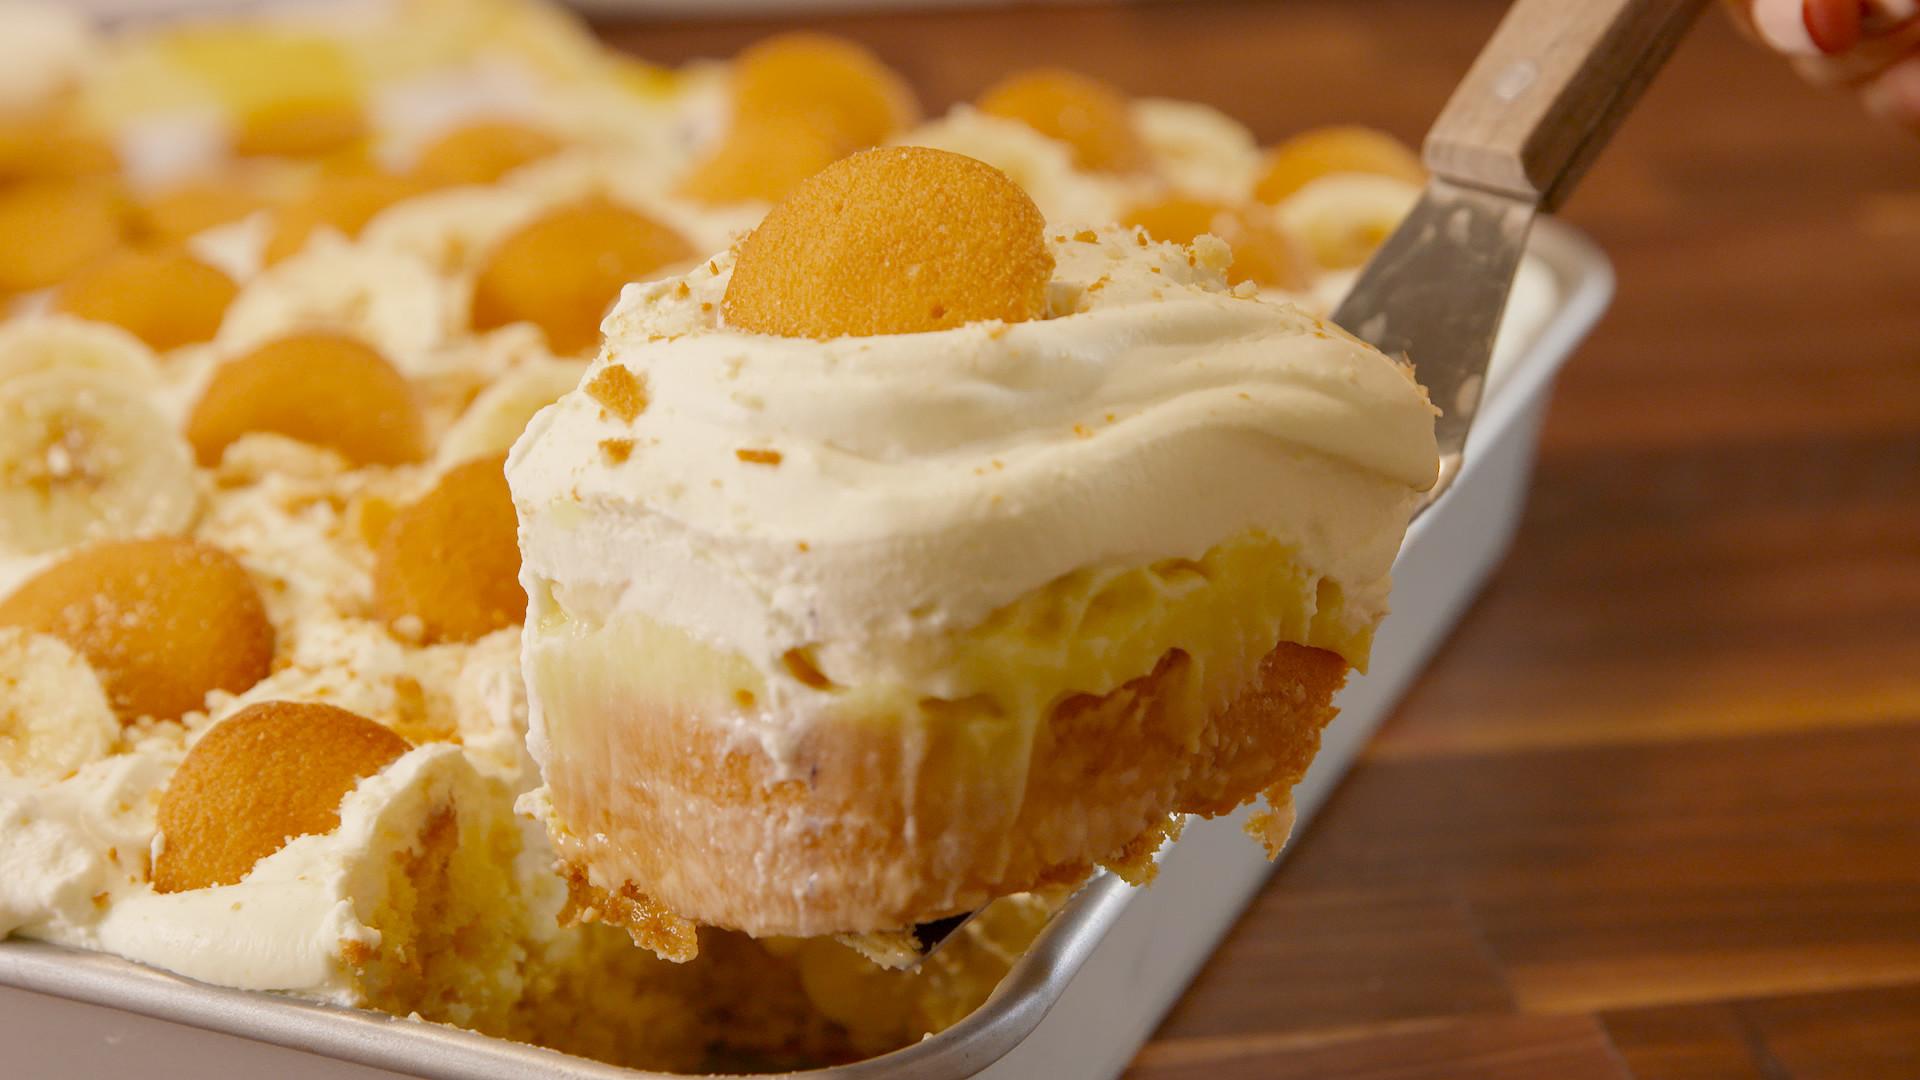 Easy Desserts Recipes  70 Easy Dessert Recipes – Ideas for Easiest Homemade